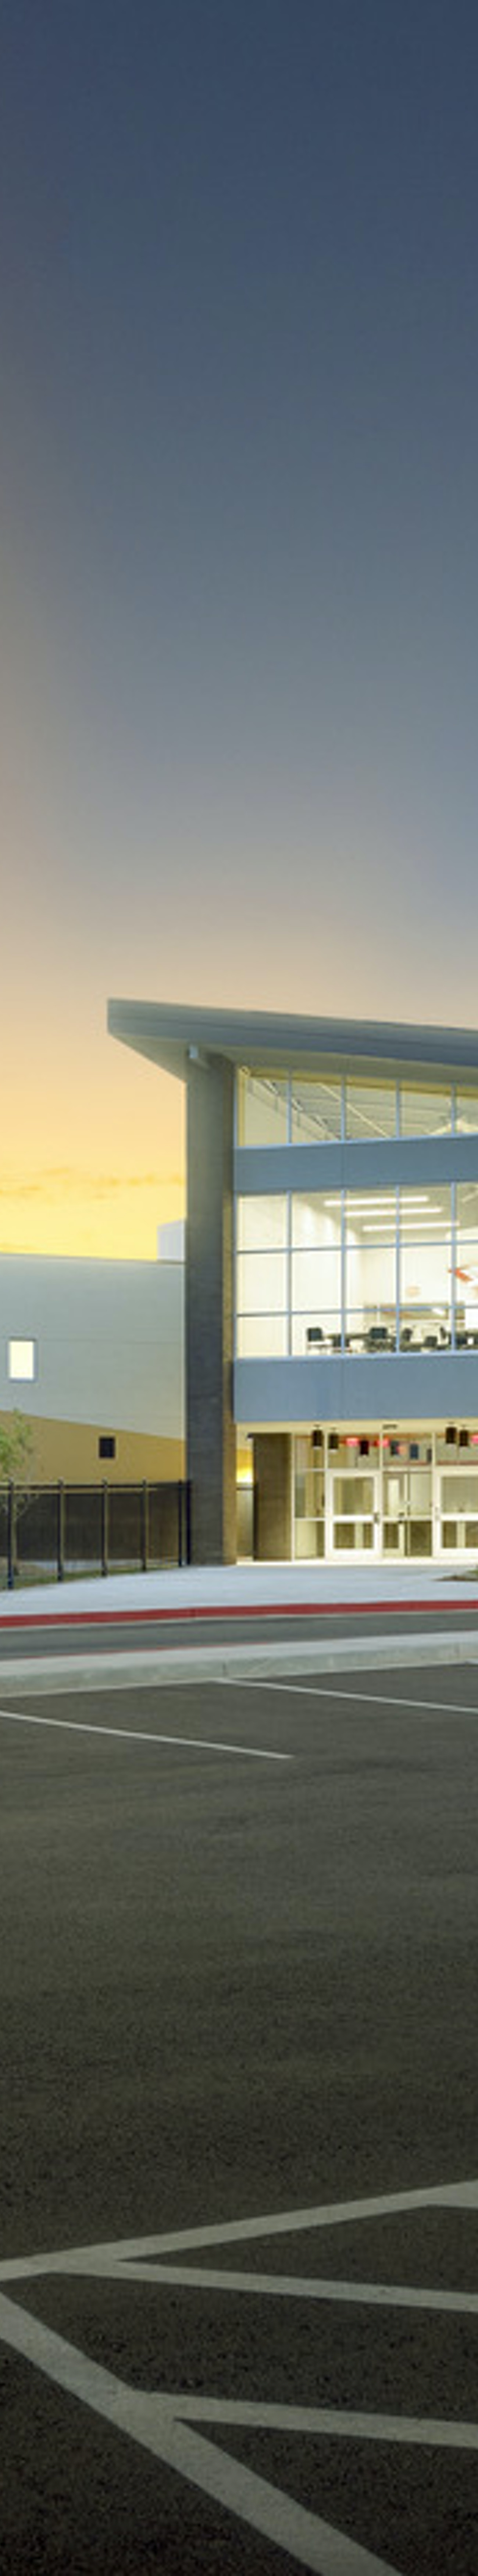 Culberson County Allamoore ISD New K12 School